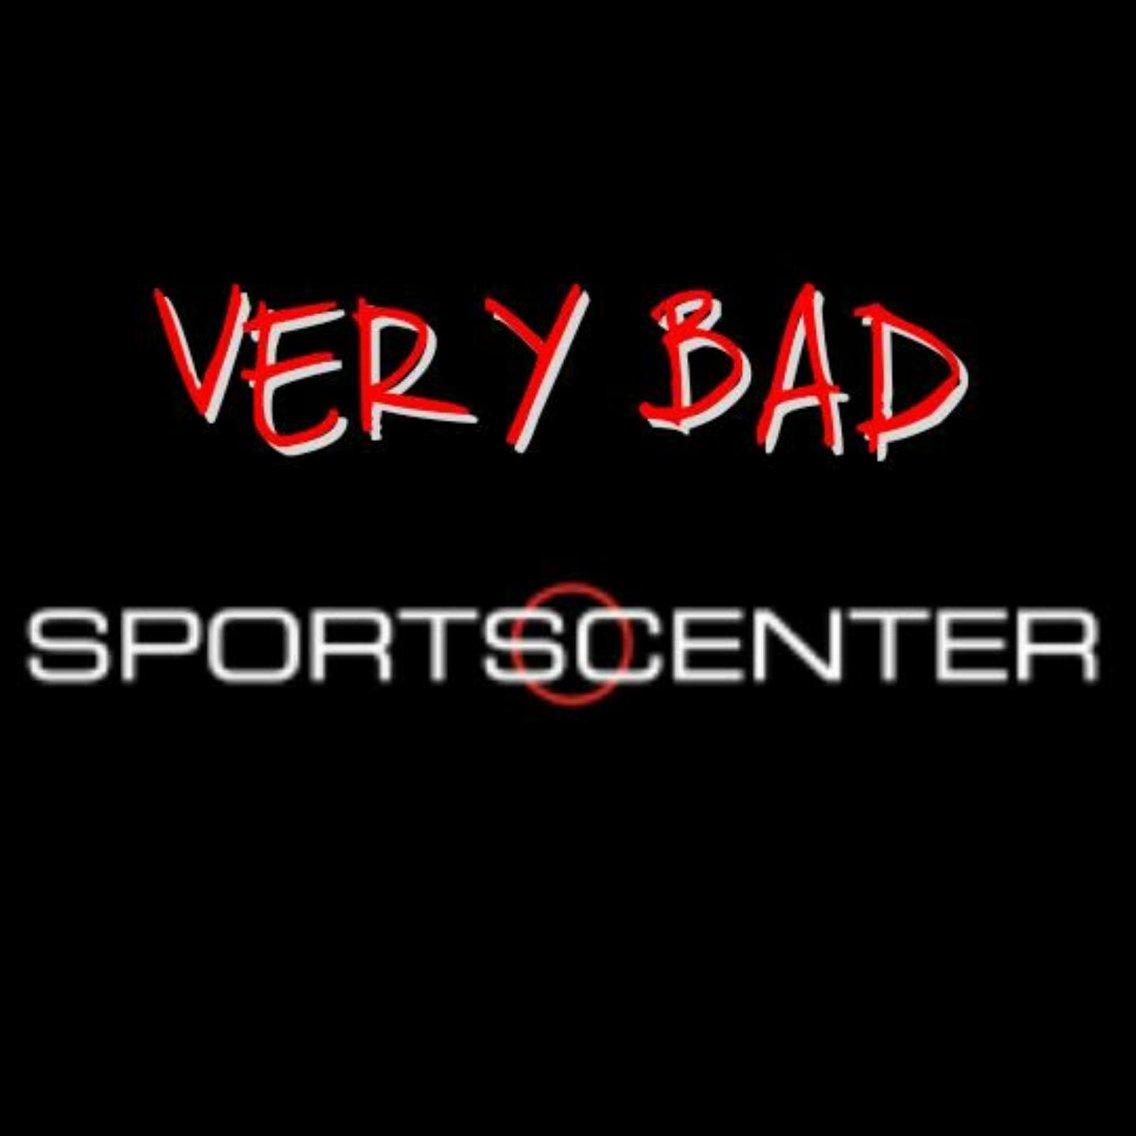 Very Bad SportsCenter - immagine di copertina